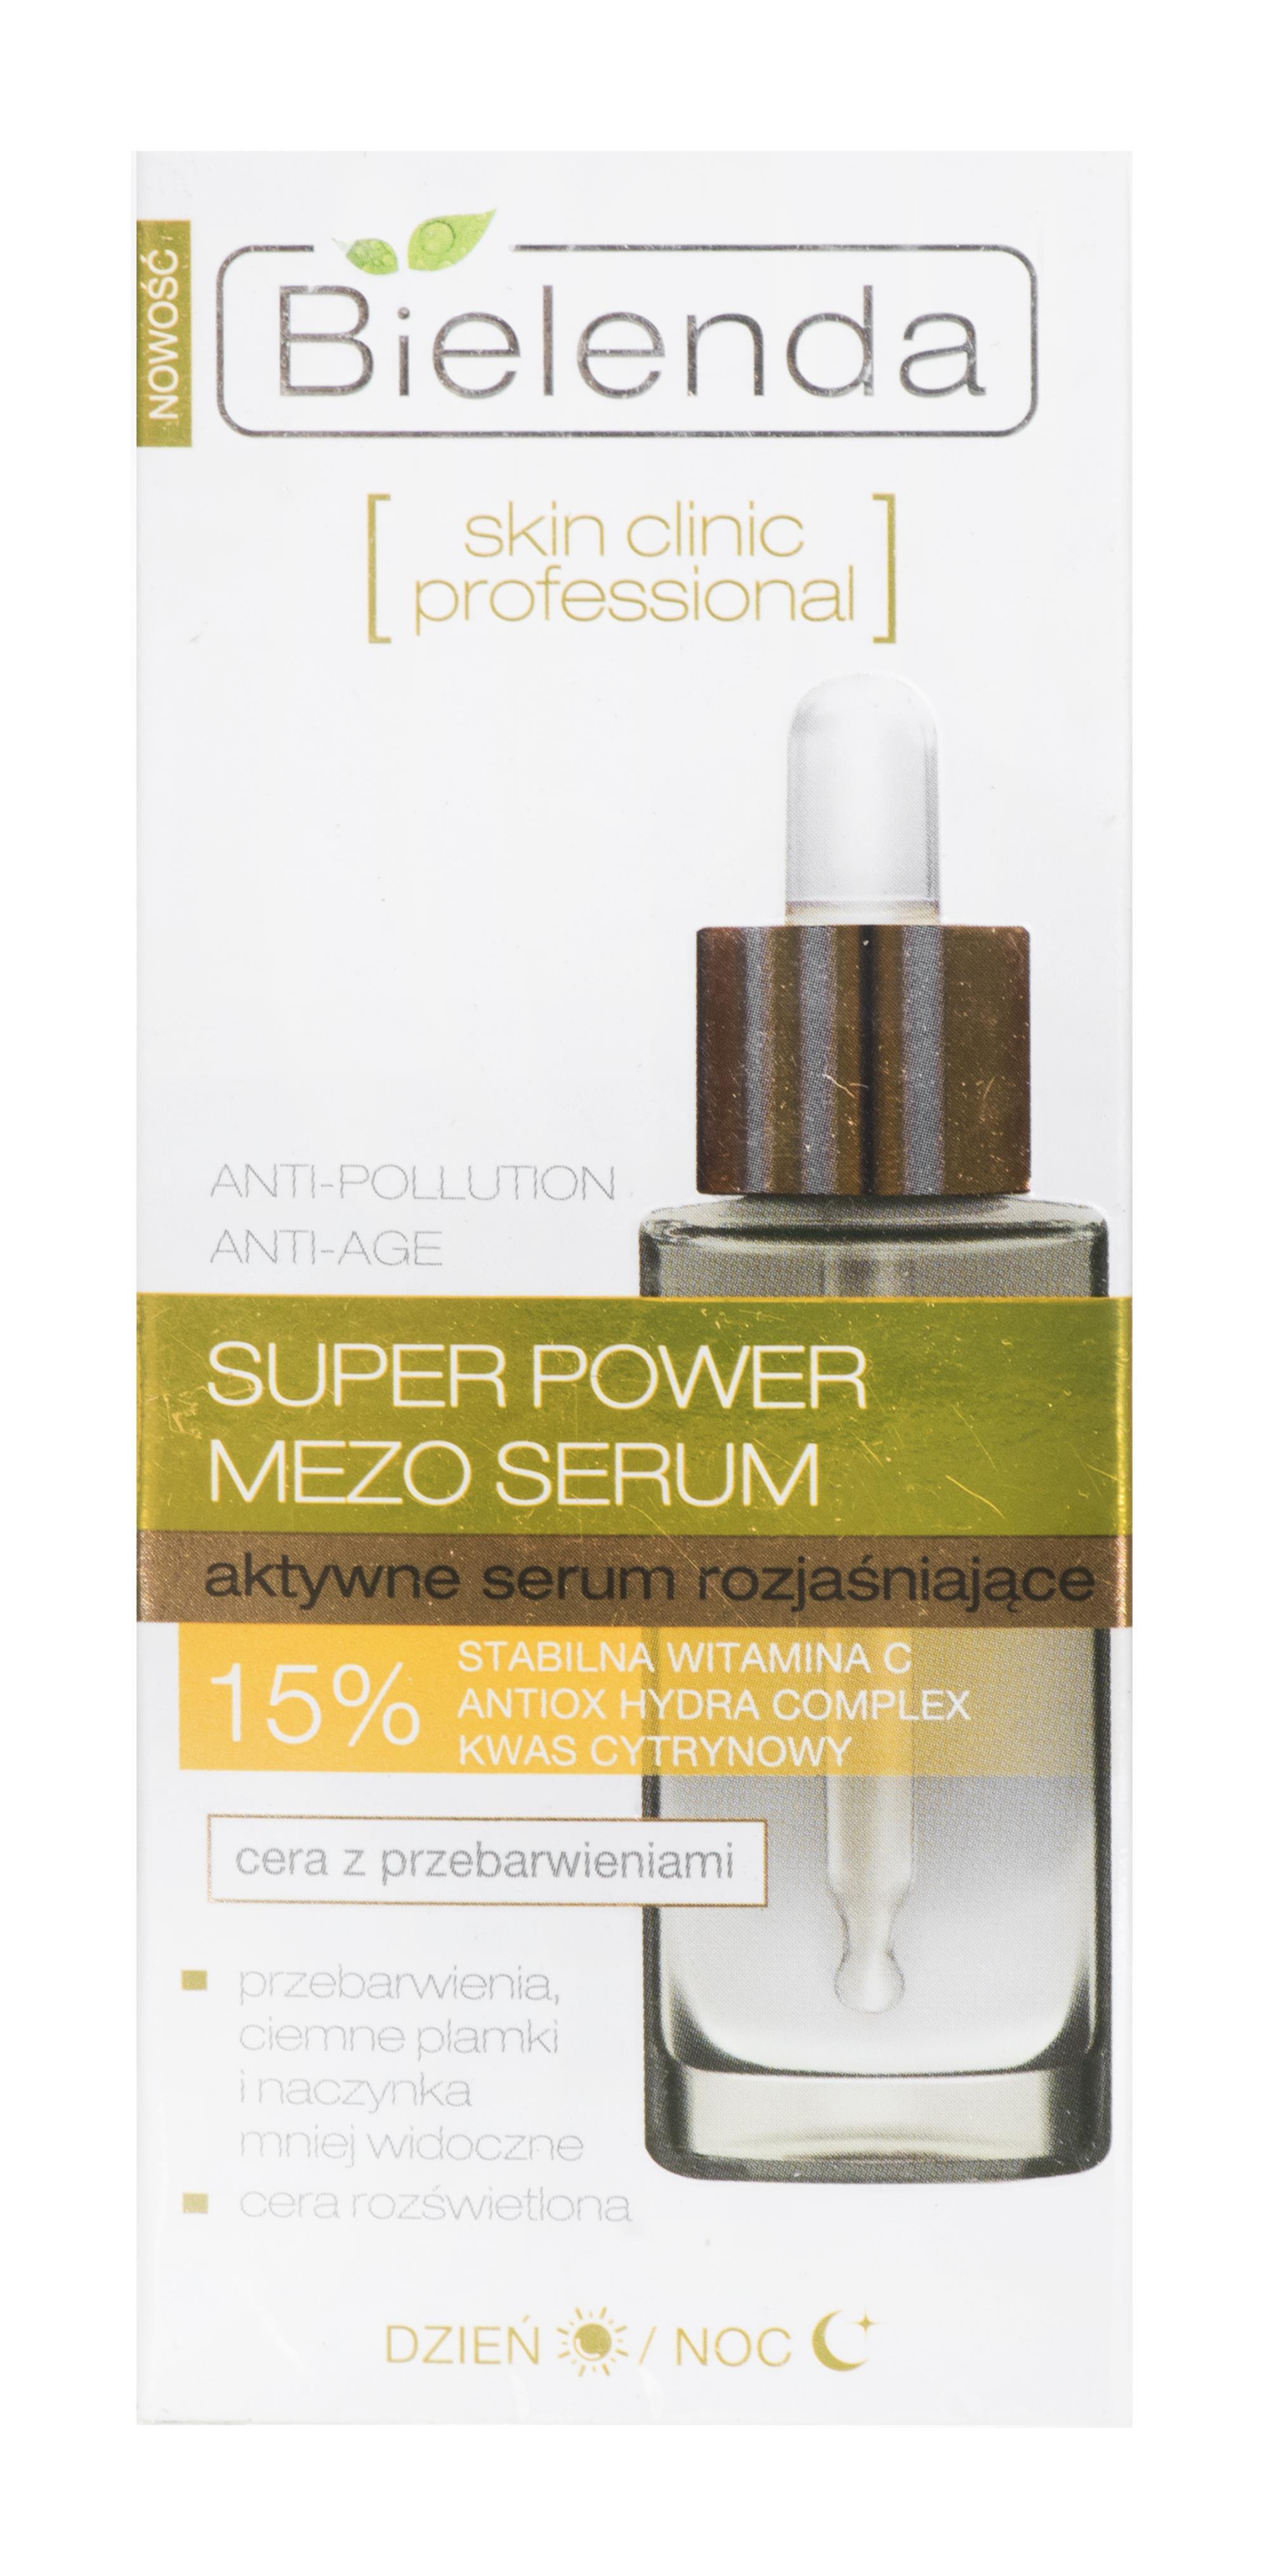 Bielenda Skin Clinic Professional Brightening day and night serum 30ml